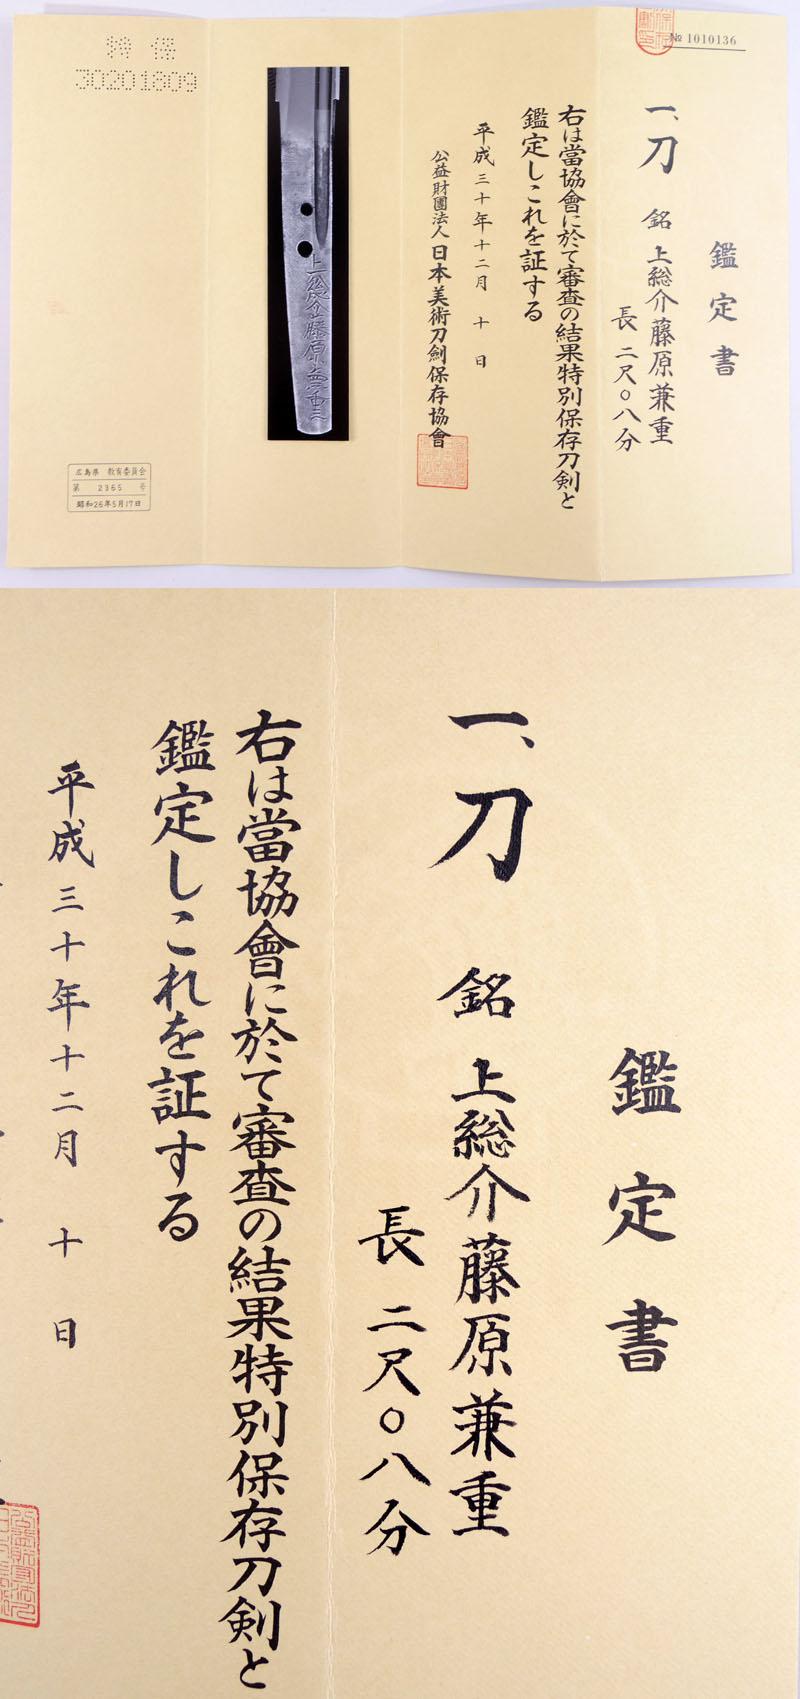 上総介藤原兼重 Picture of Certificate